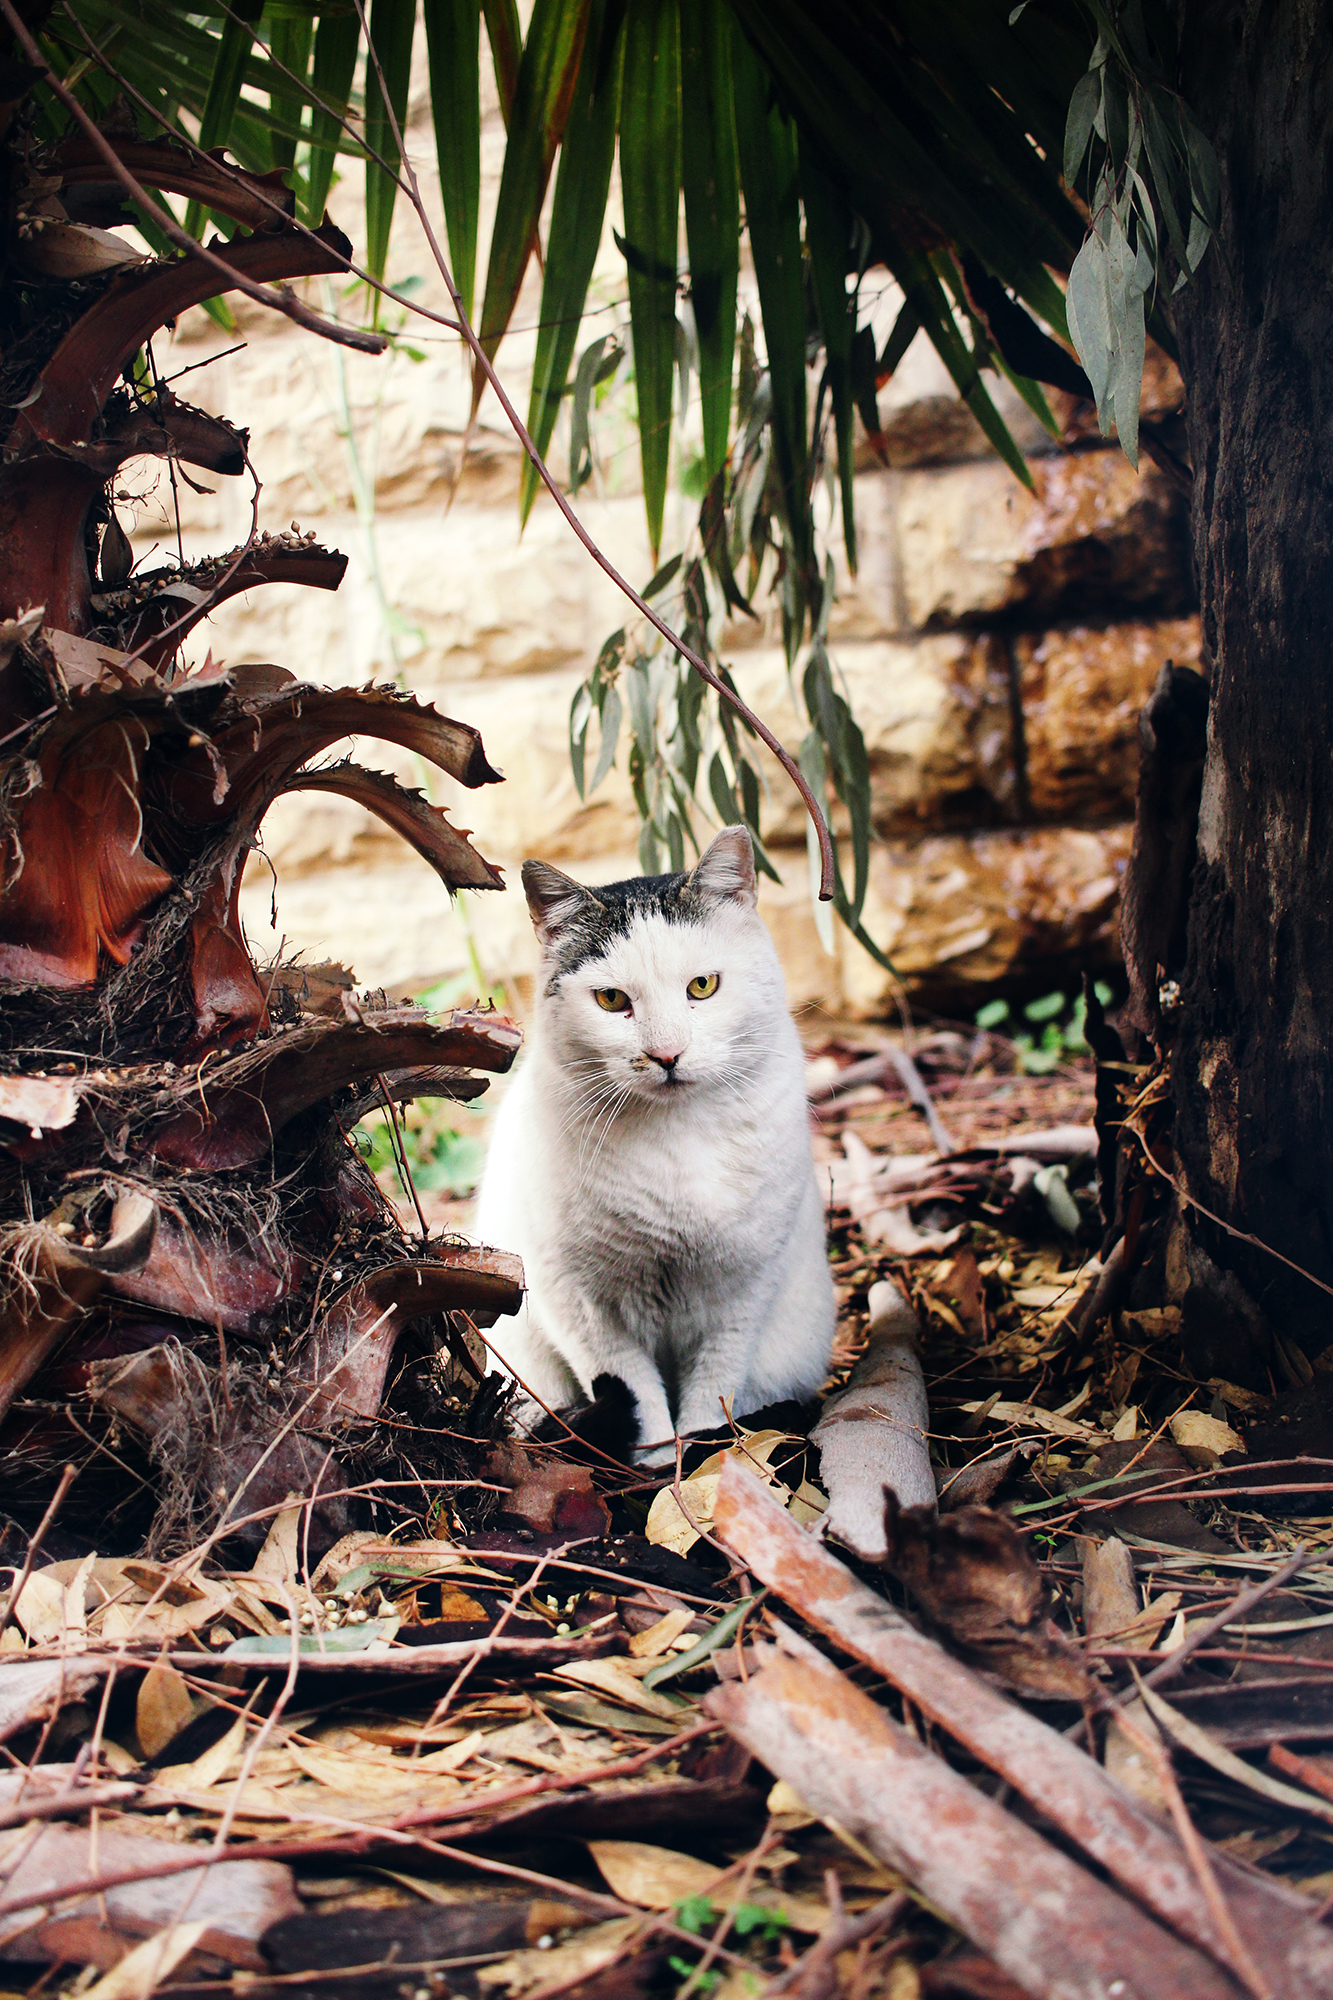 The Perfect Pet Photo,    captured in Yemin Moshe, Old Jerusalem, Israel. Travel photography by Geena Matuson @geenamatuson #thegirlmirage.